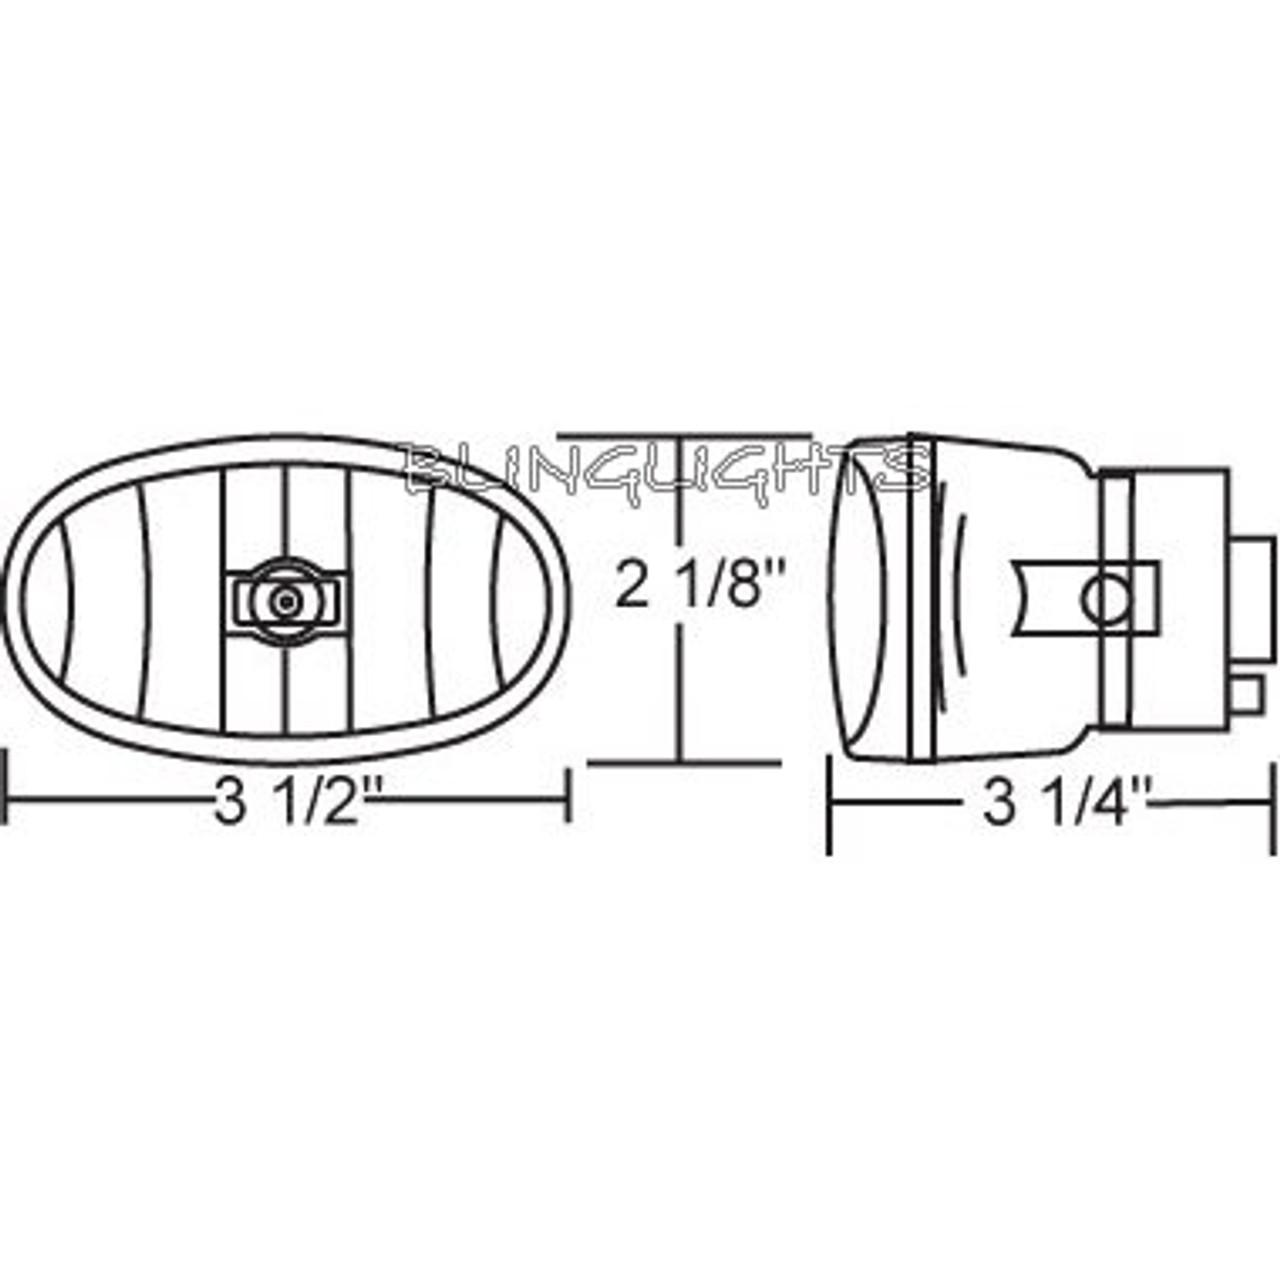 medium resolution of yamaha tdm 850 wiring diagram wiring diagramyamaha tdm 850 wiring diagram